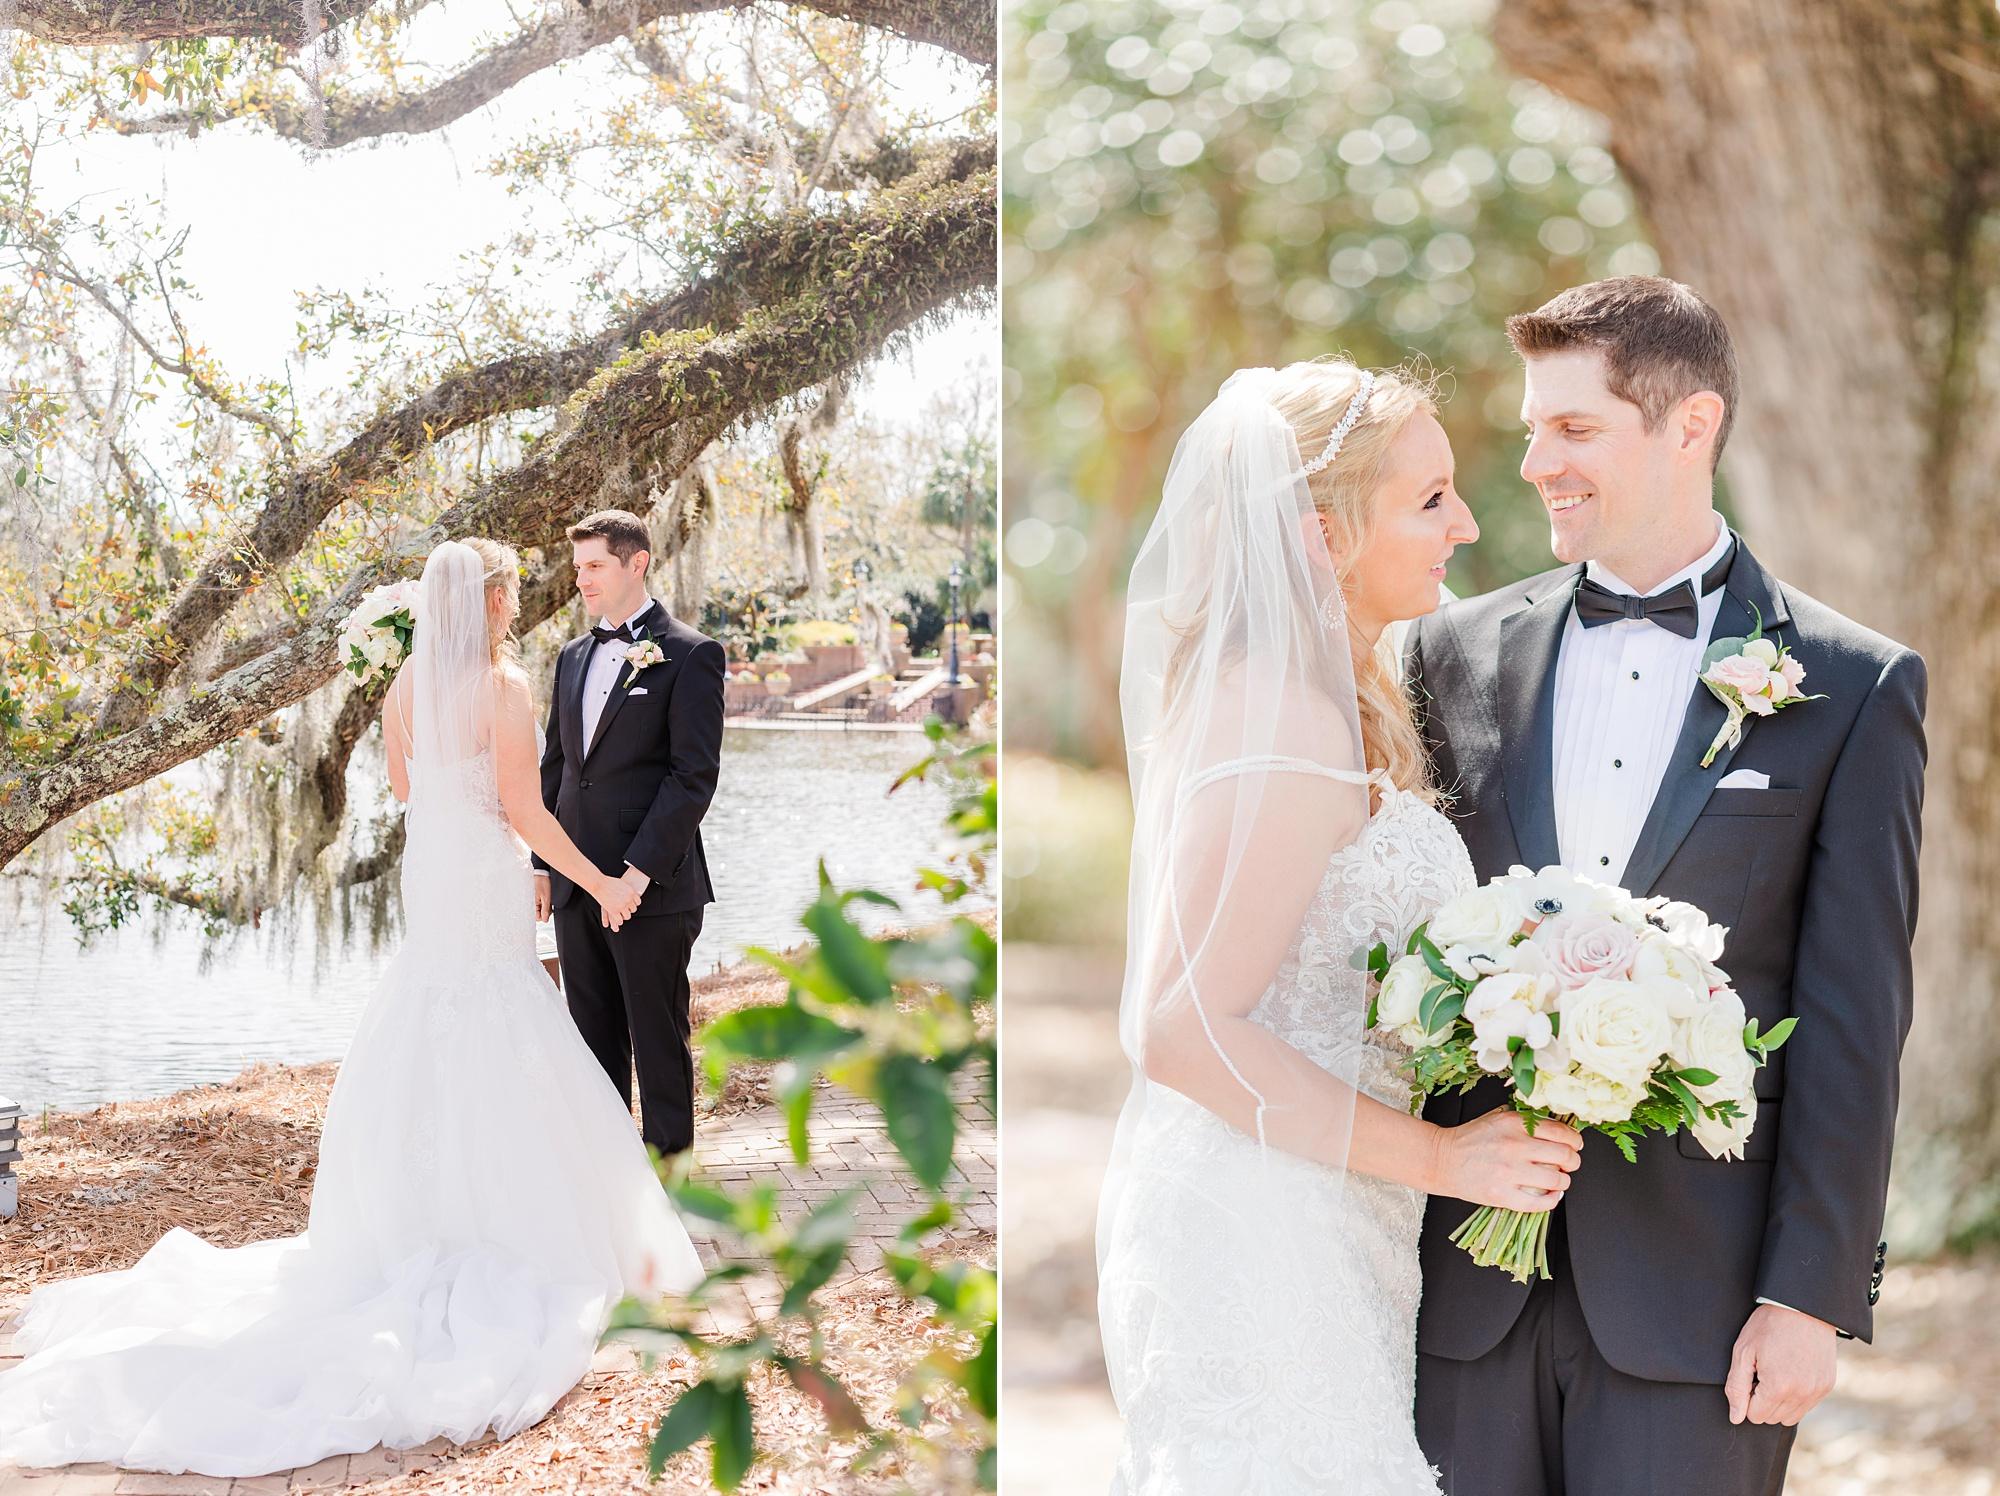 Alabama wedding portraits with bride and groom by tree